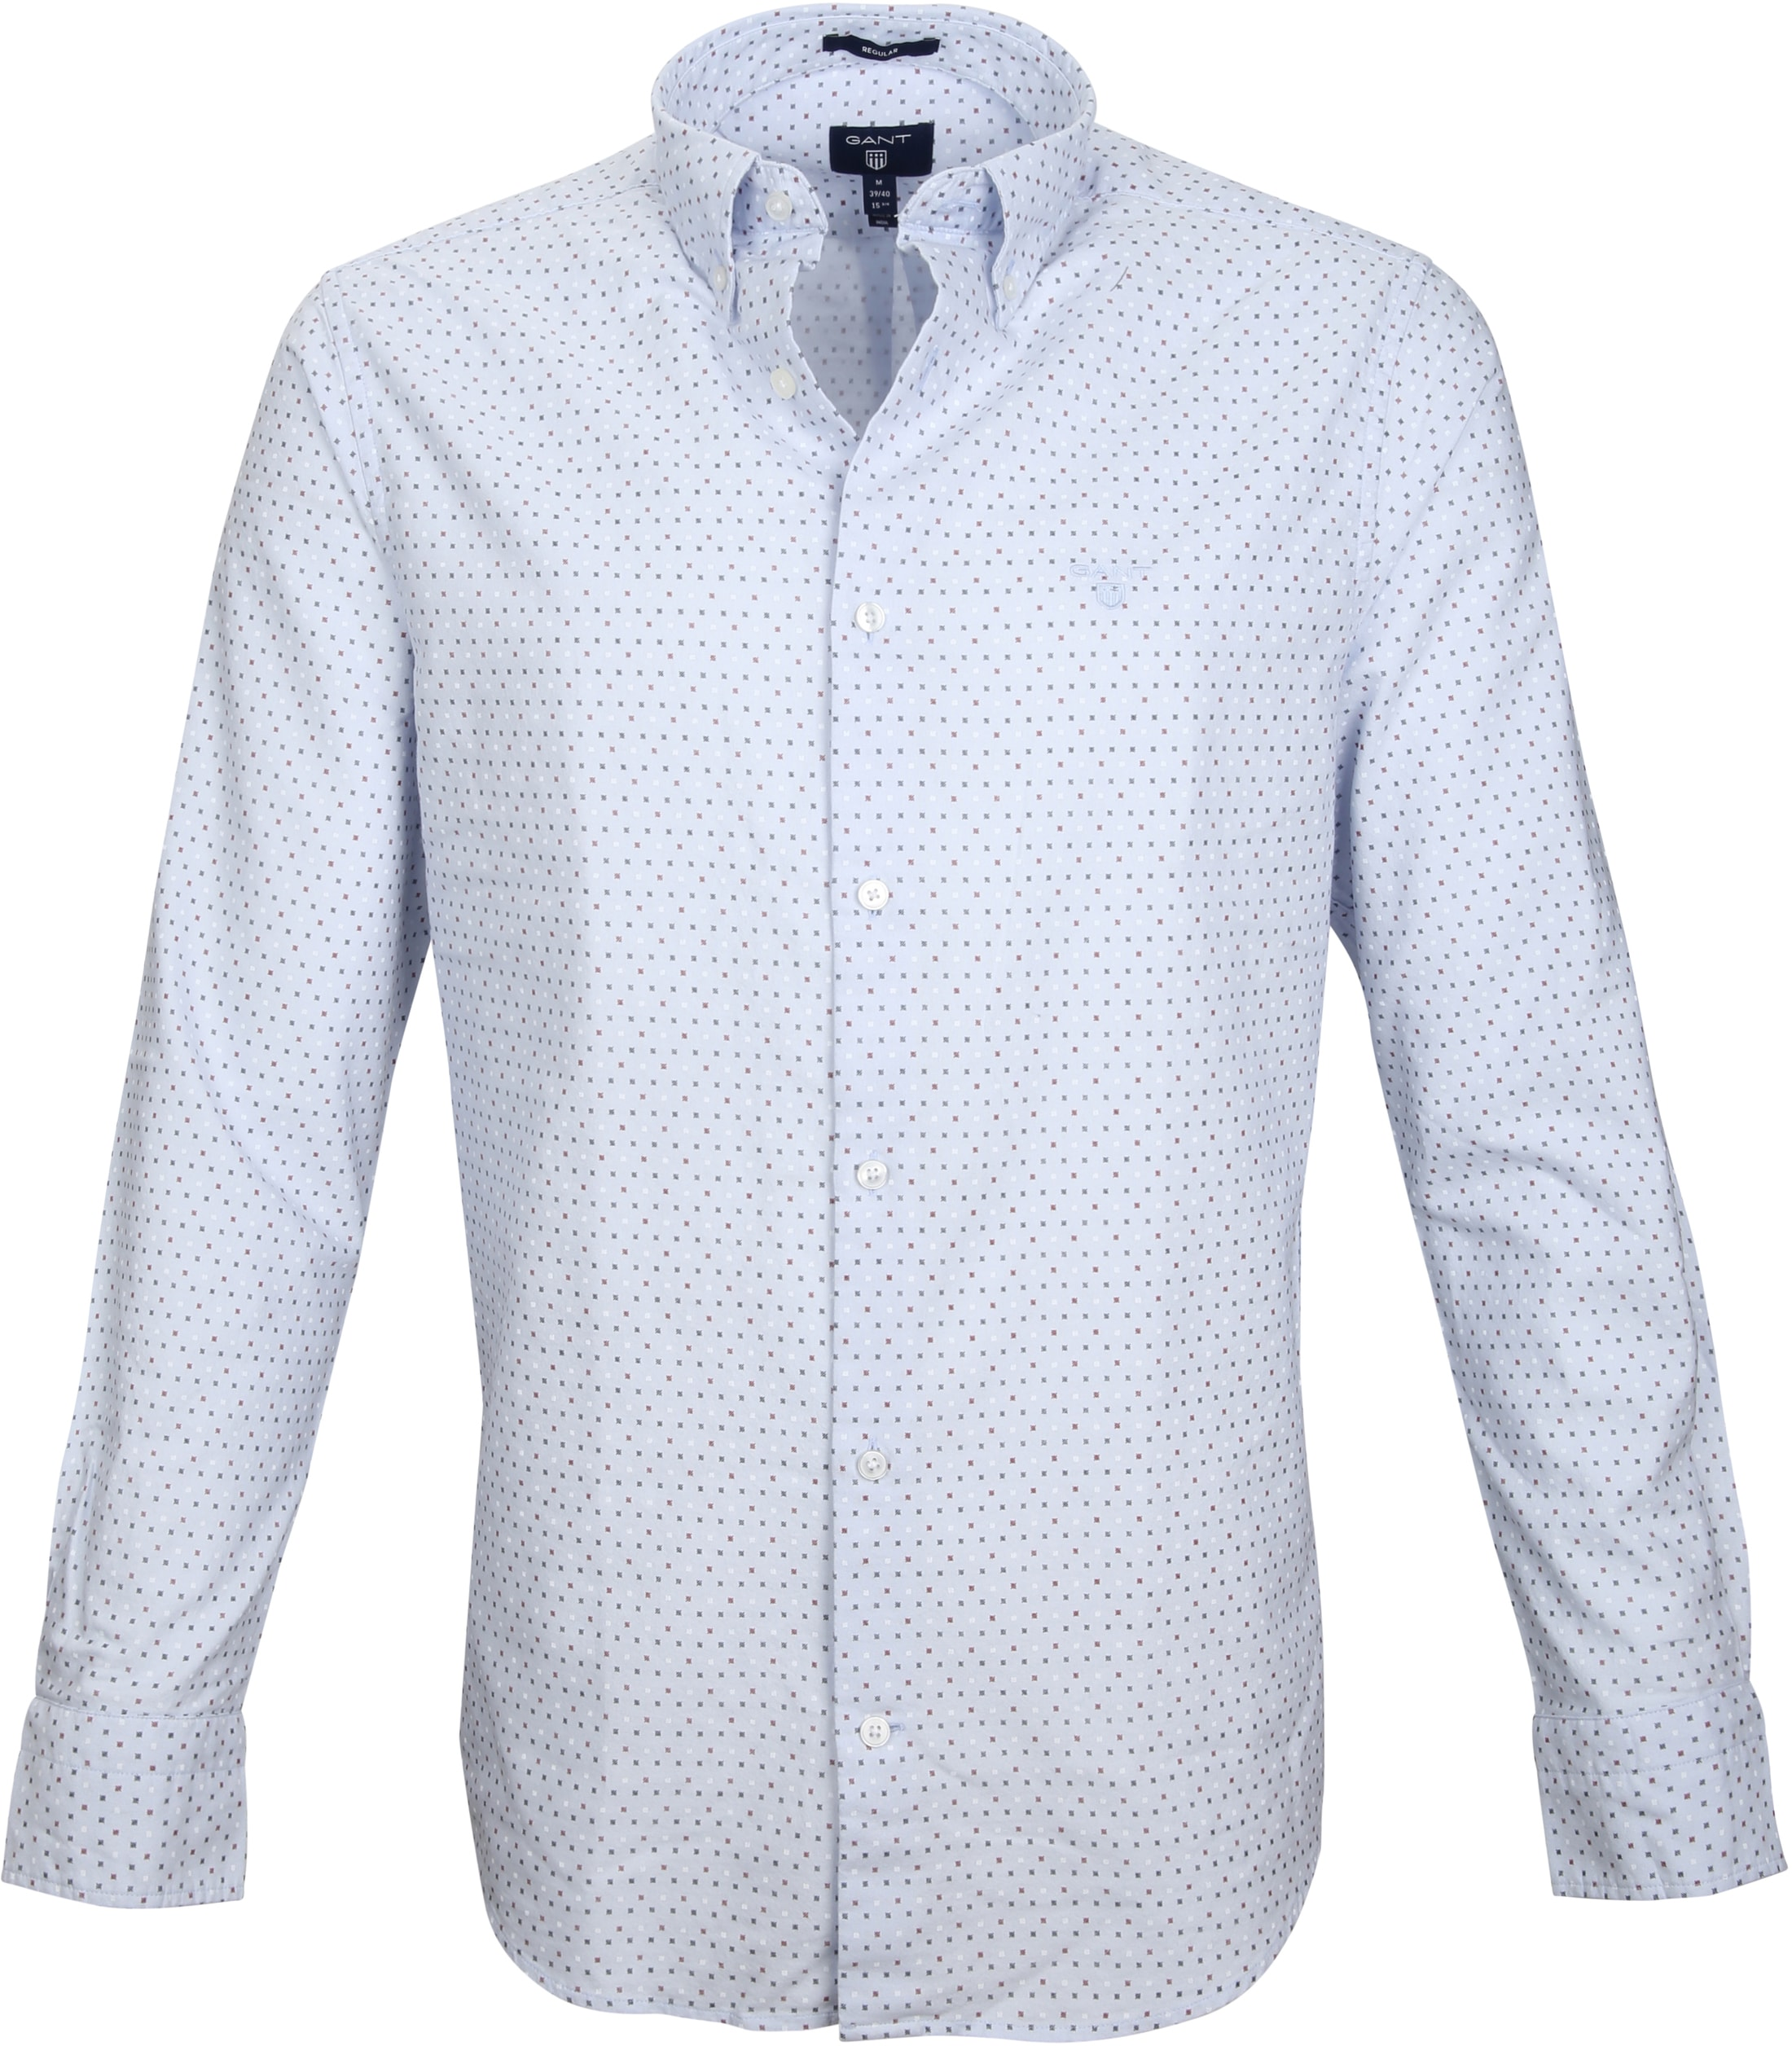 Gant Casual Overhemd Print Blauw foto 0